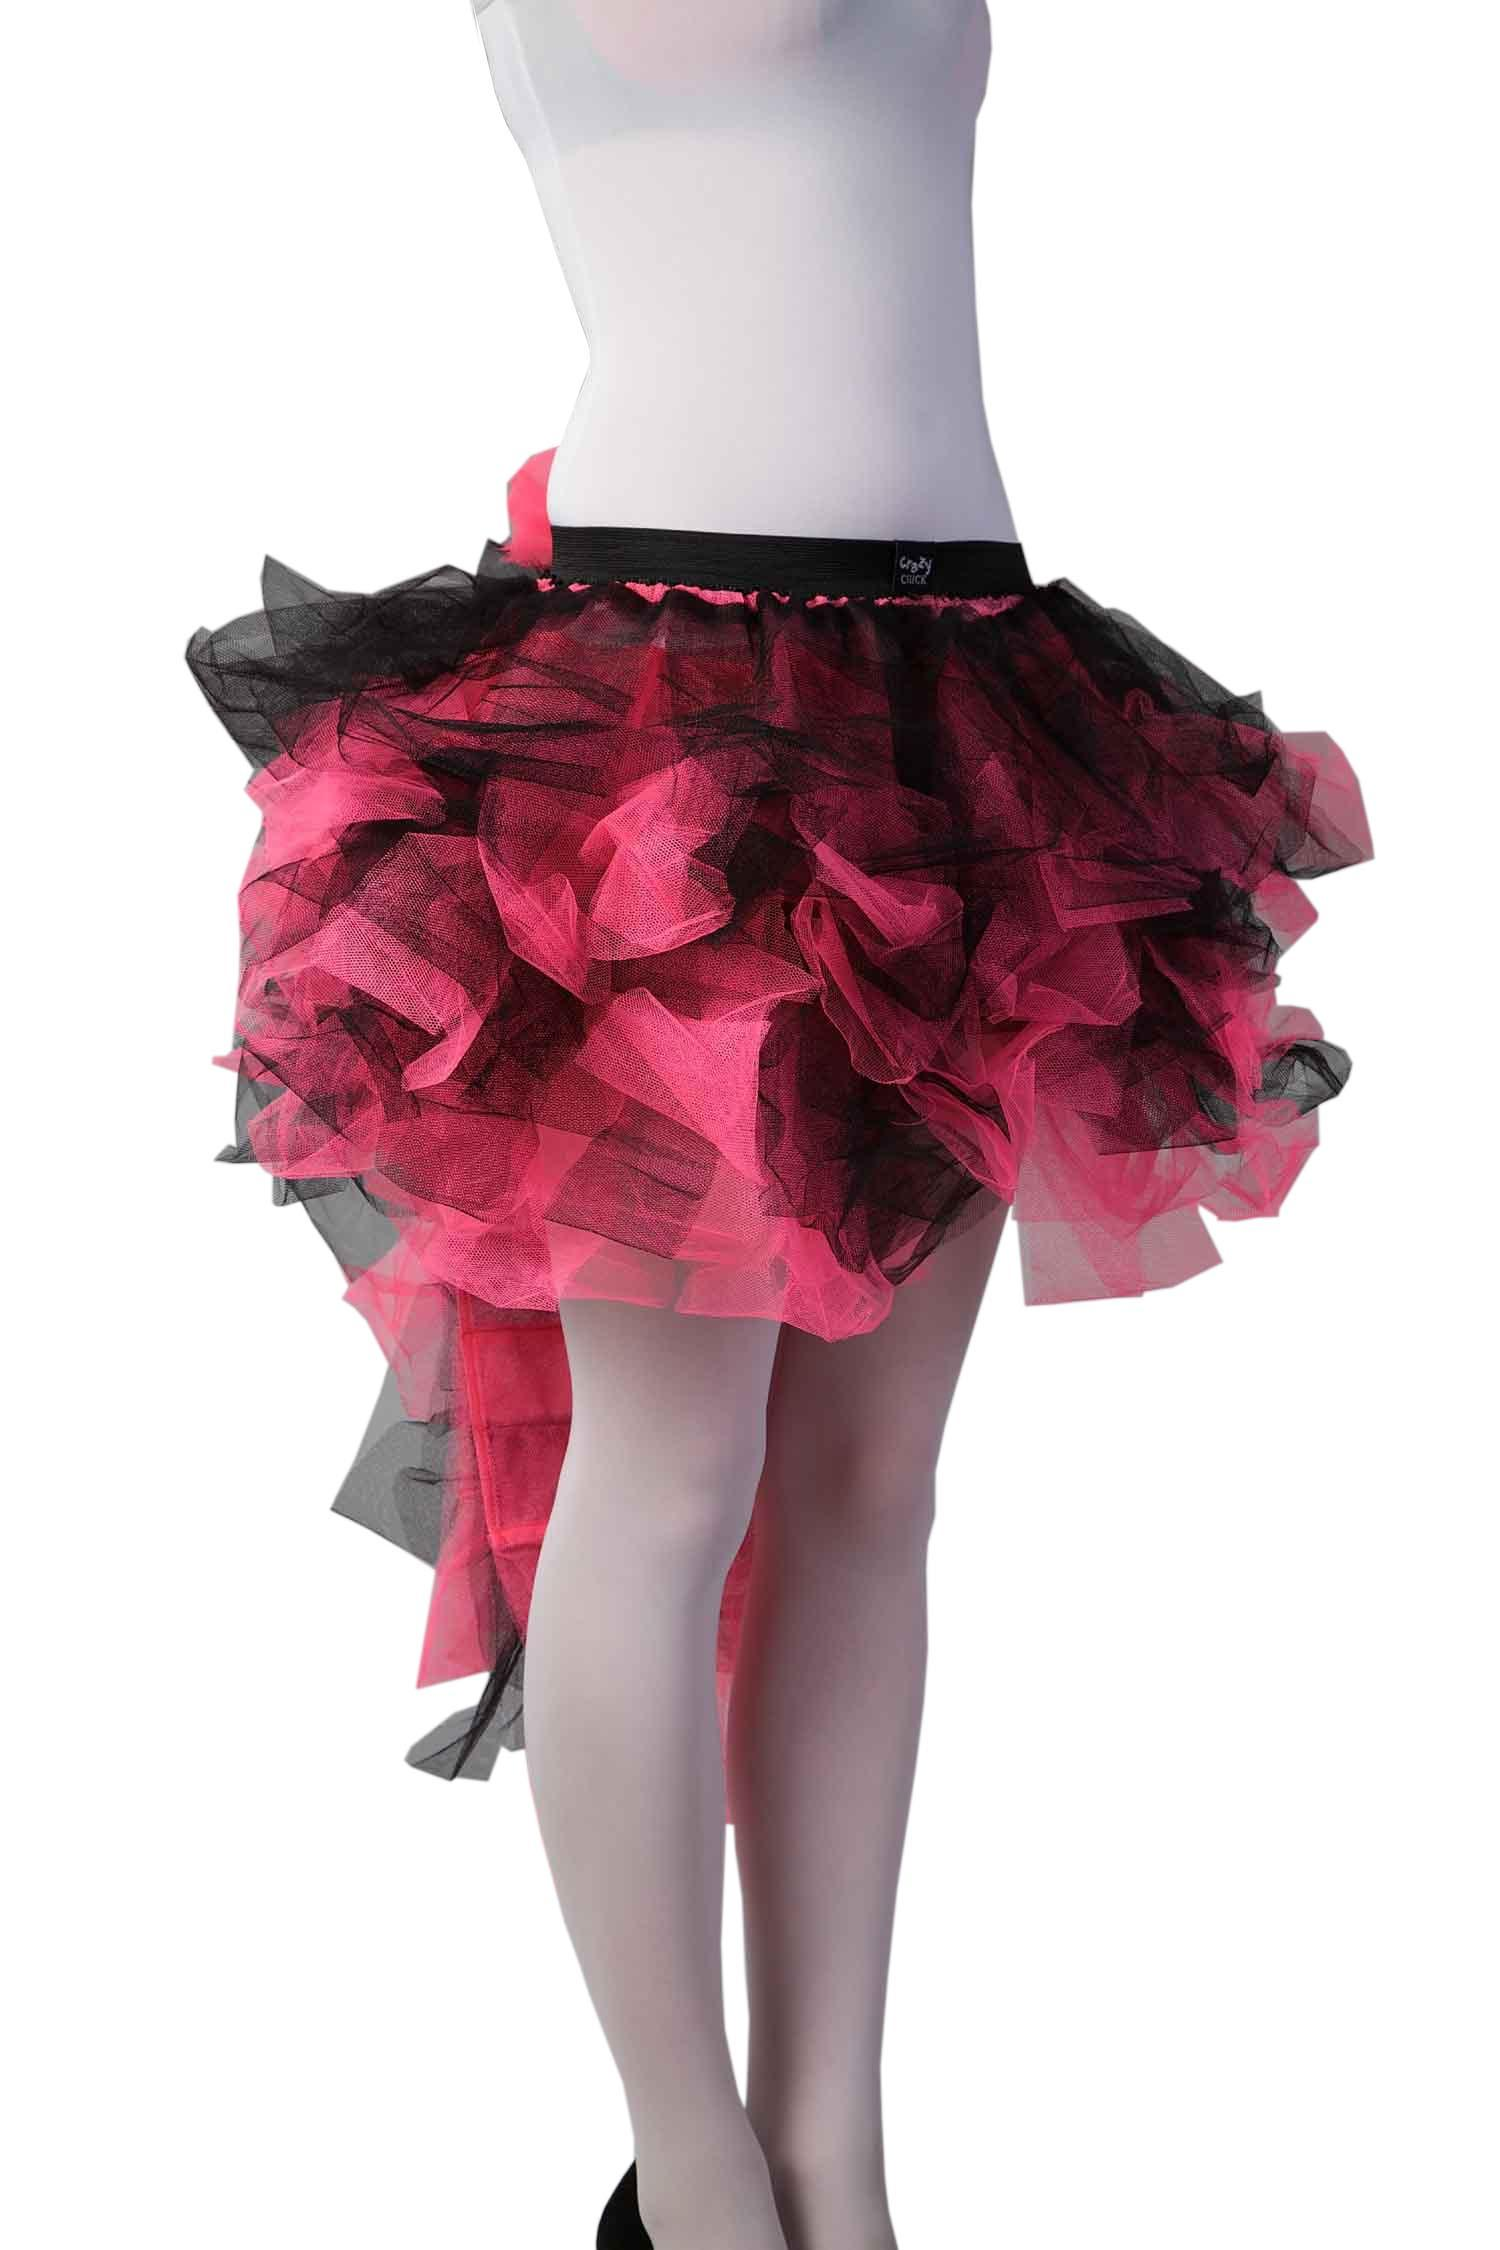 Crazy Chick Long Tail Burlesque Black and Pink TuTu Skirt